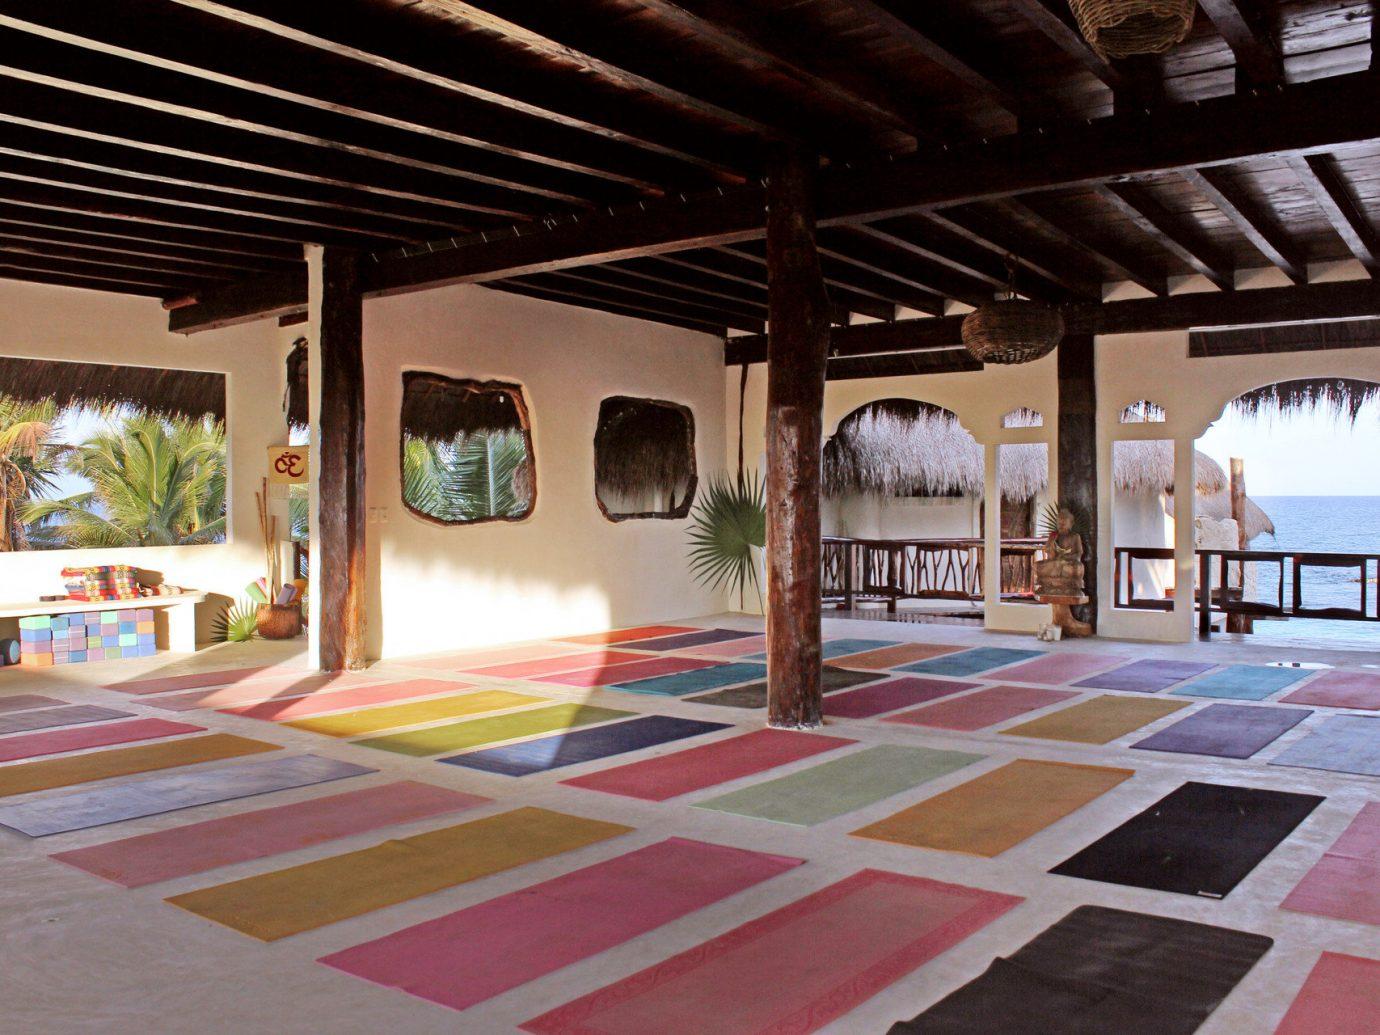 Health + Wellness Hotels Yoga Retreats leisure building property room Resort estate Architecture home interior design Design hacienda floor